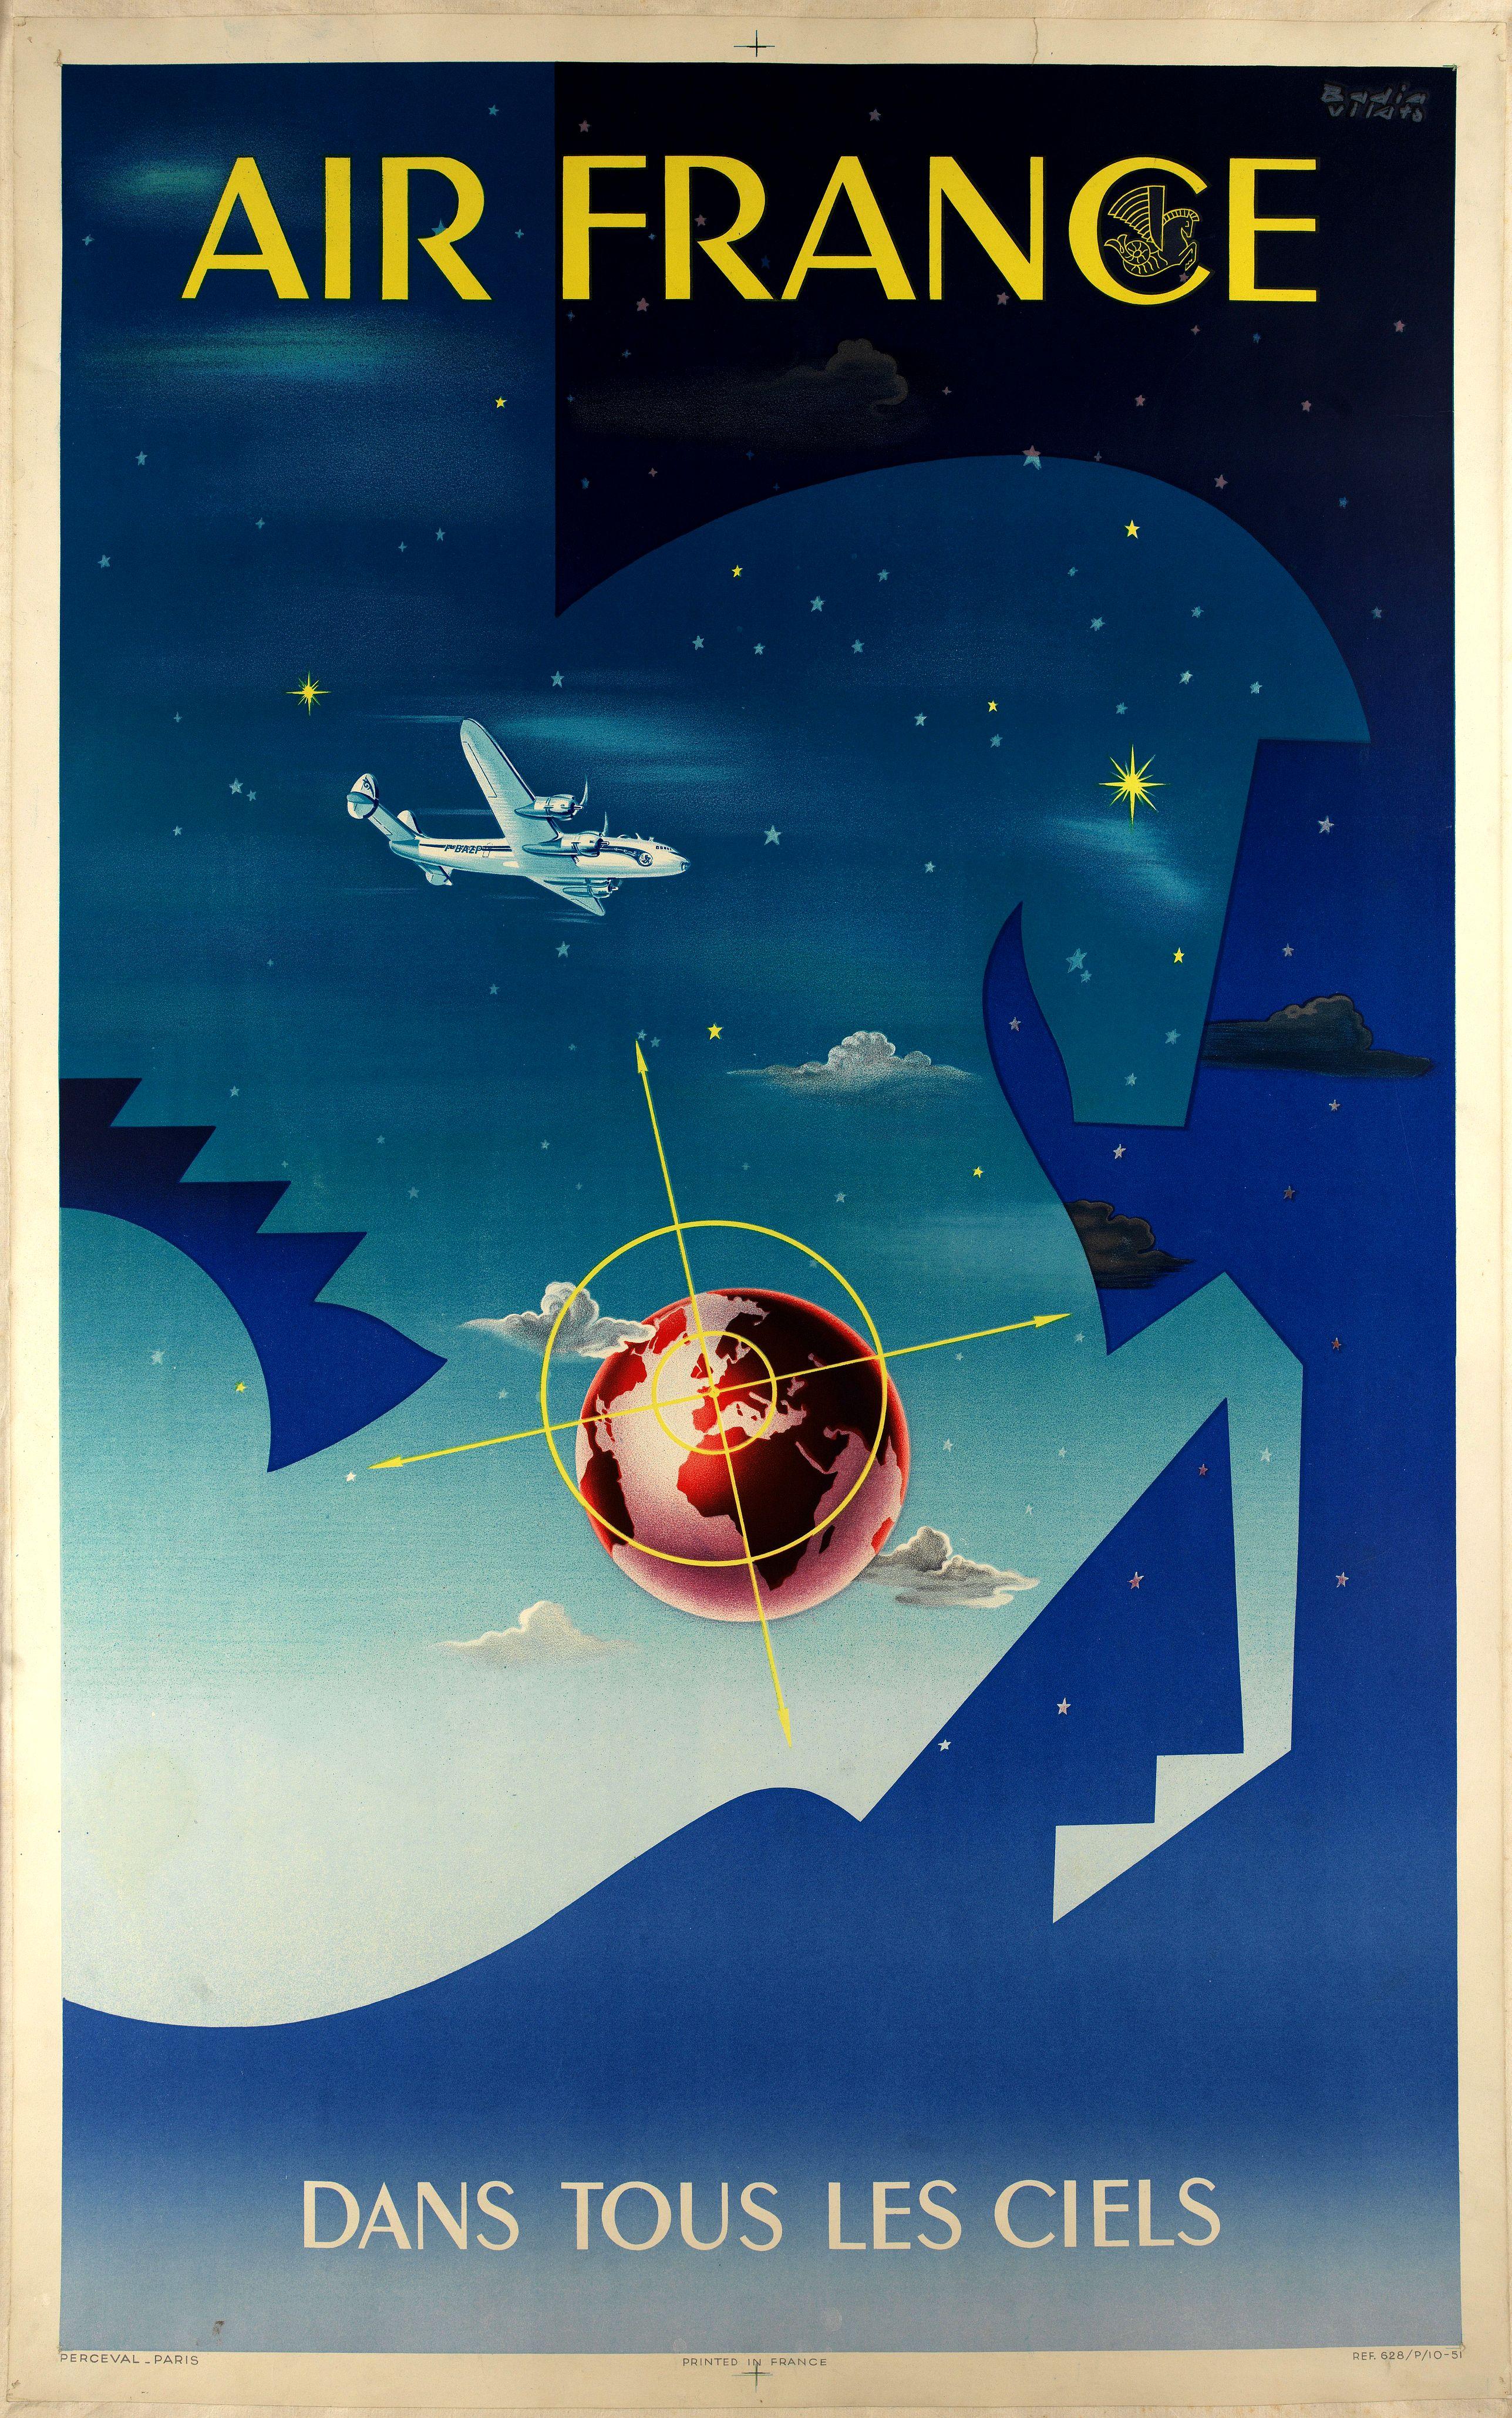 BADIA VILATO, X. -  Air France dans tous les ciels.